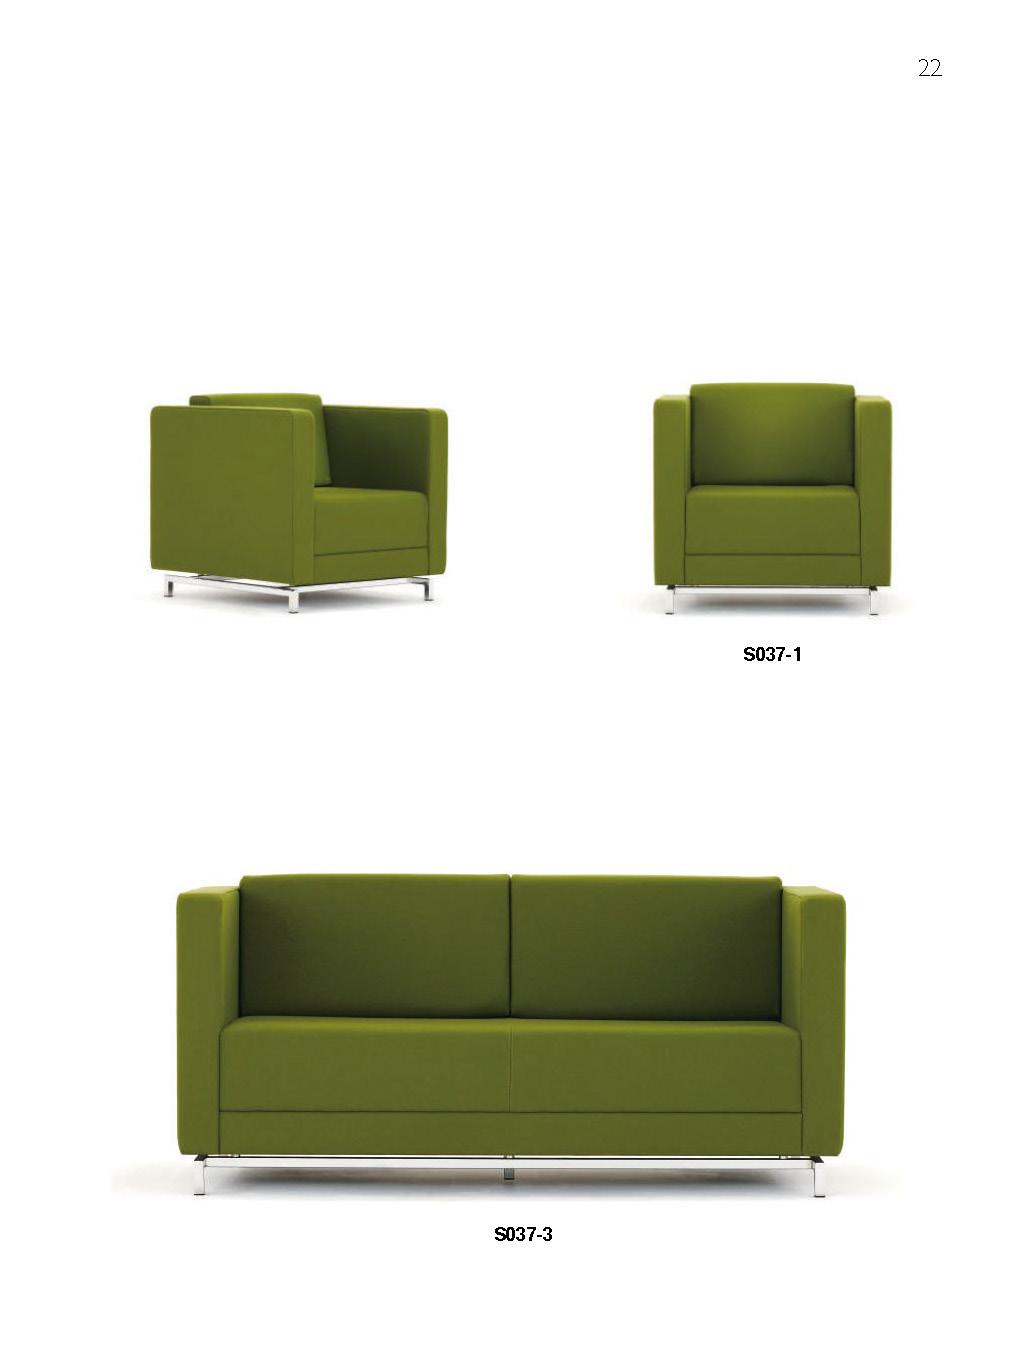 Top Furniture Catalog 2019_Page_22.jpg